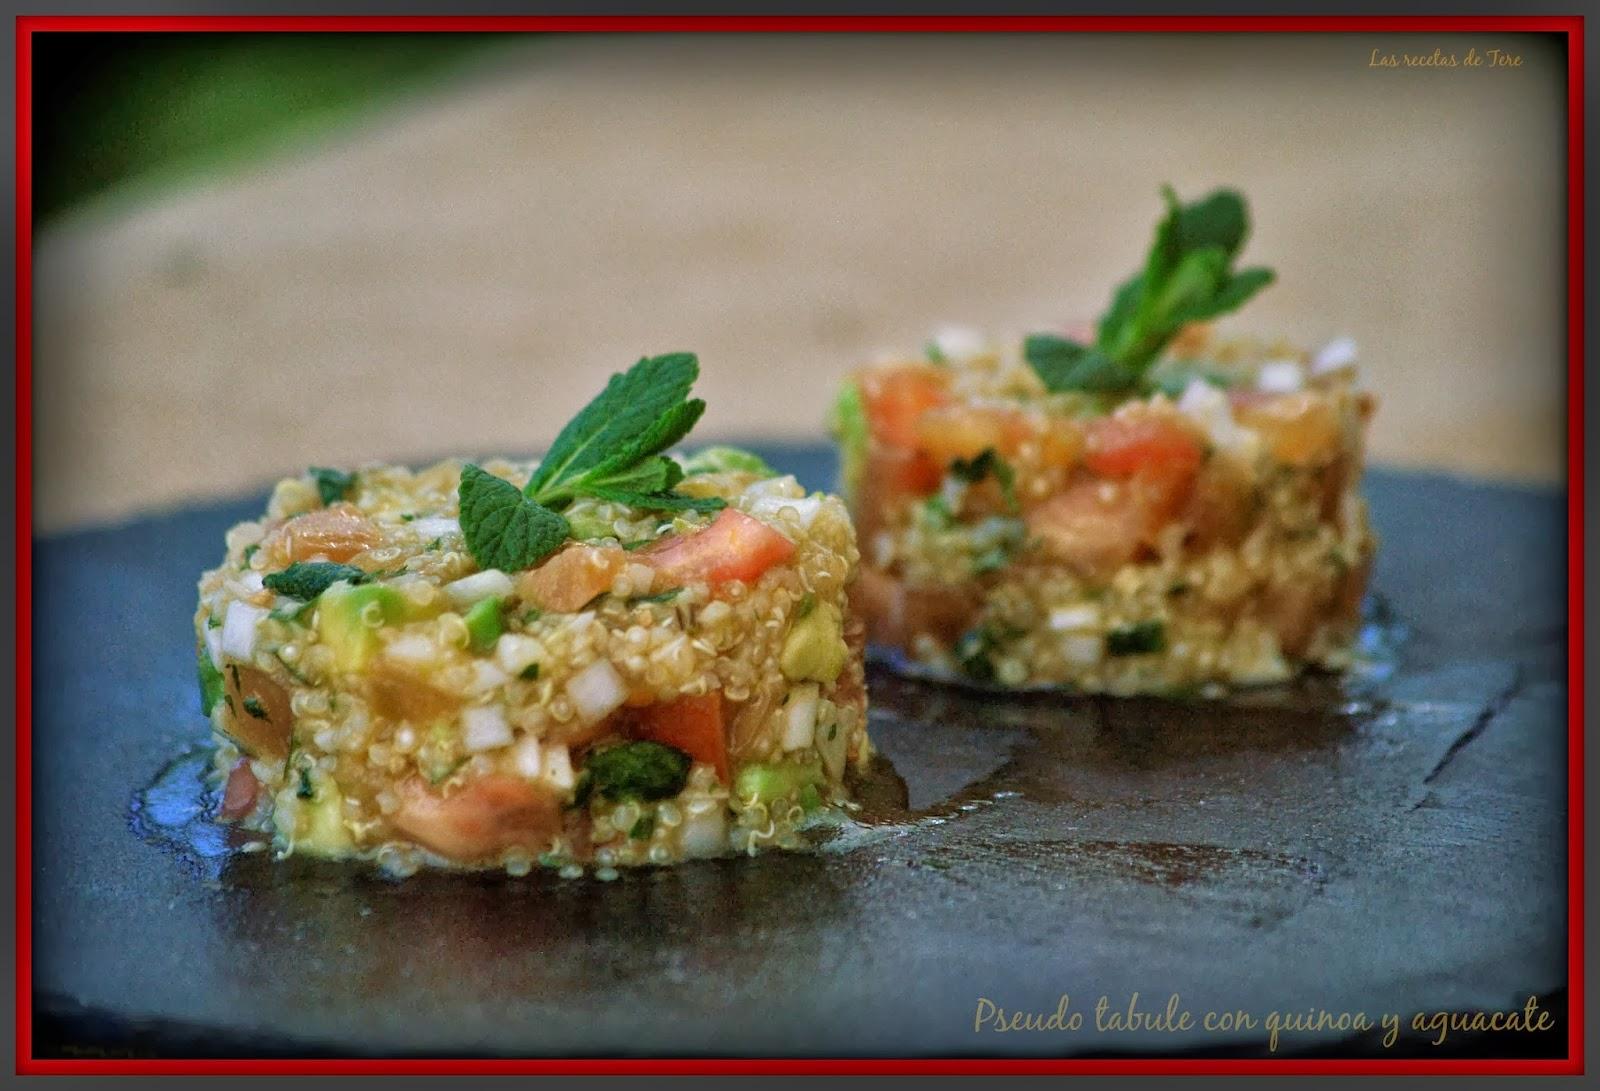 pseudo tabule con quinoa y aguacate 03